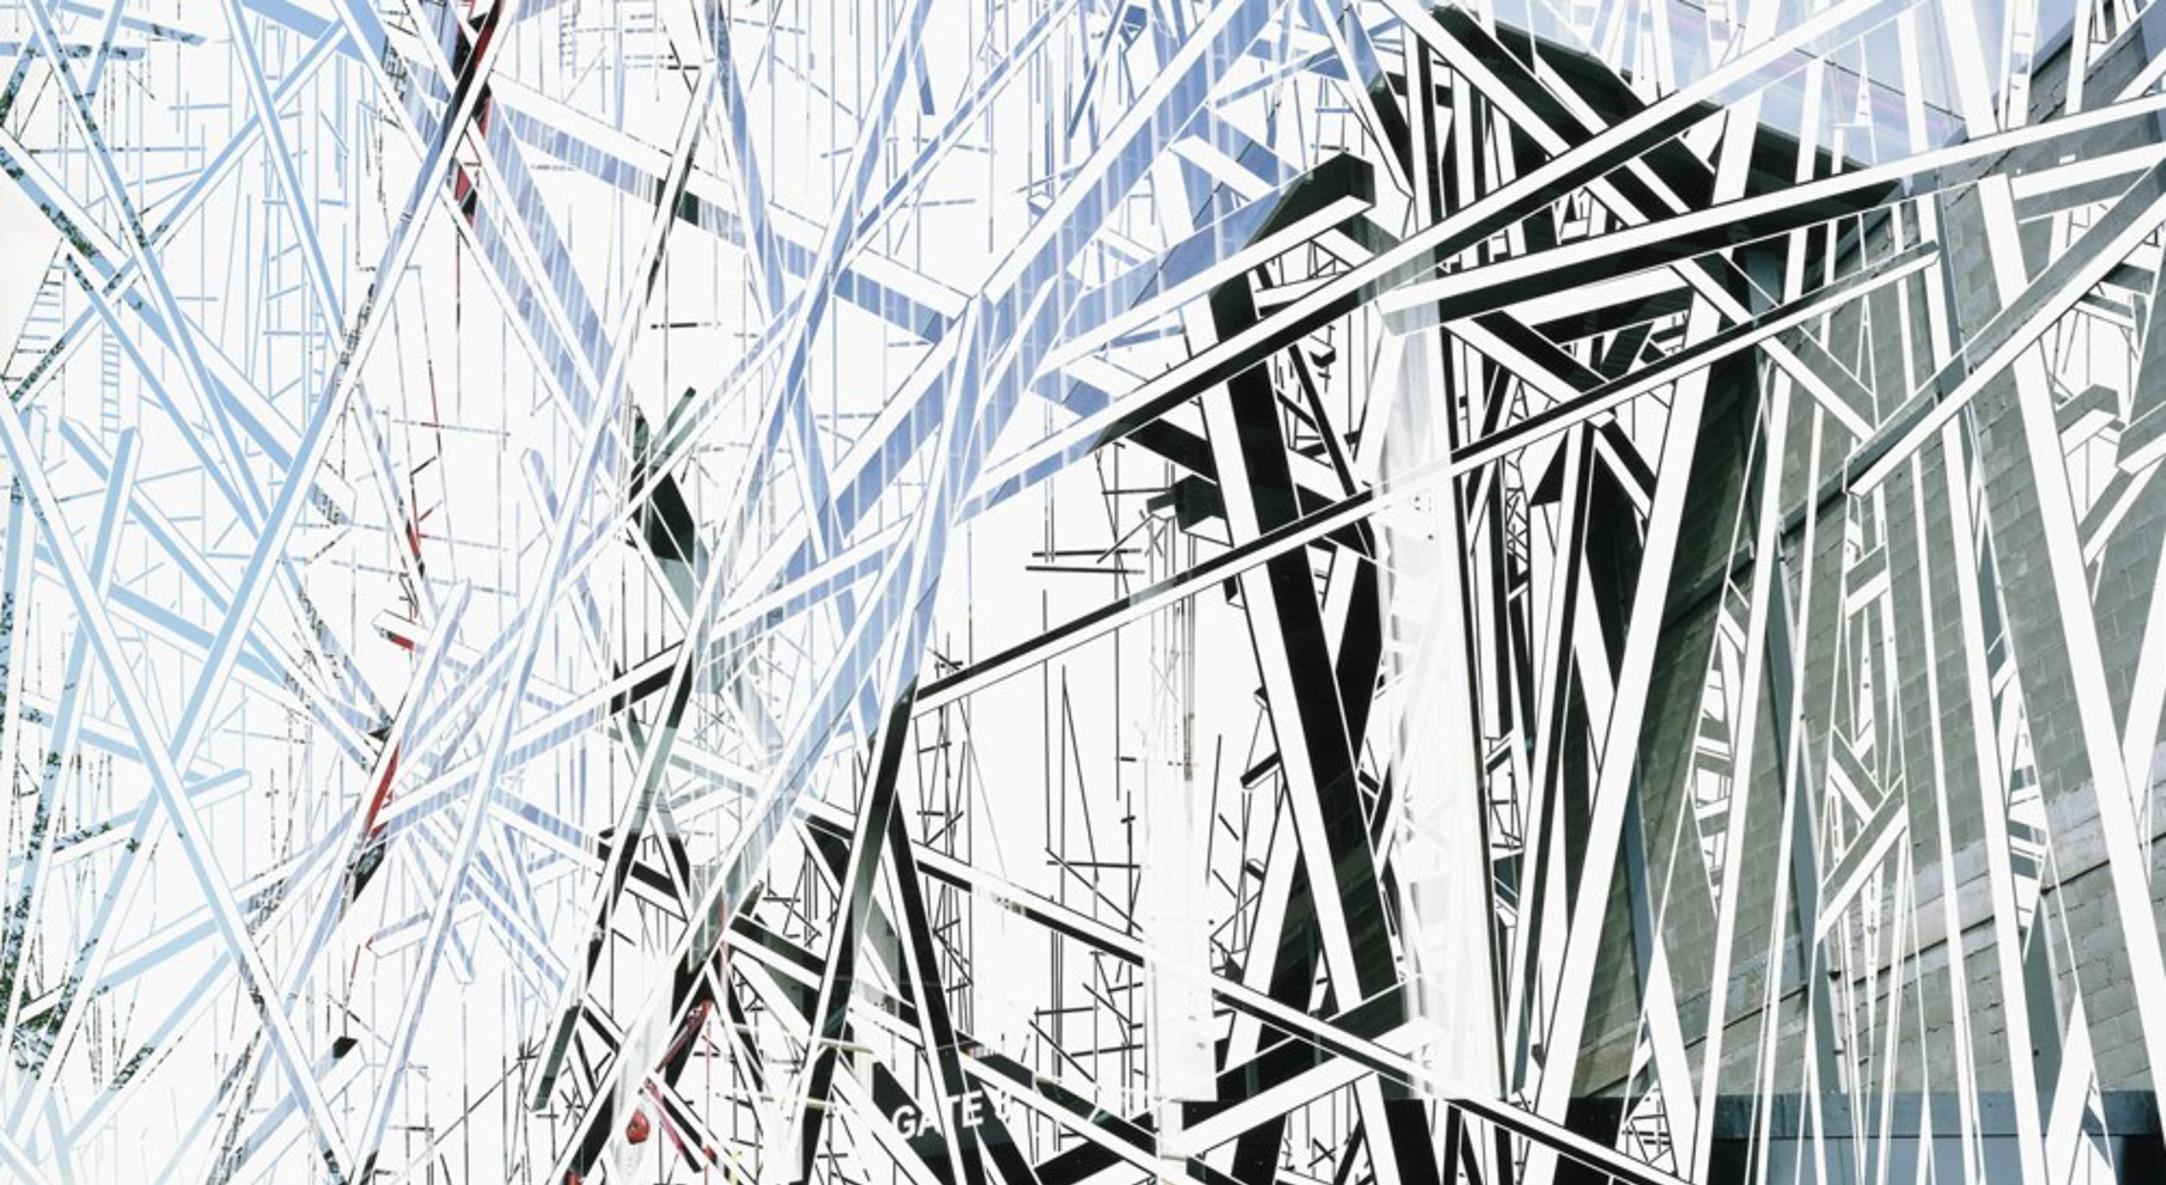 Richard Galpin, Brace II (City Gate), 2011, peeled photograph, 95 x 109 cm, 37 3/8 x 42 7/8 in